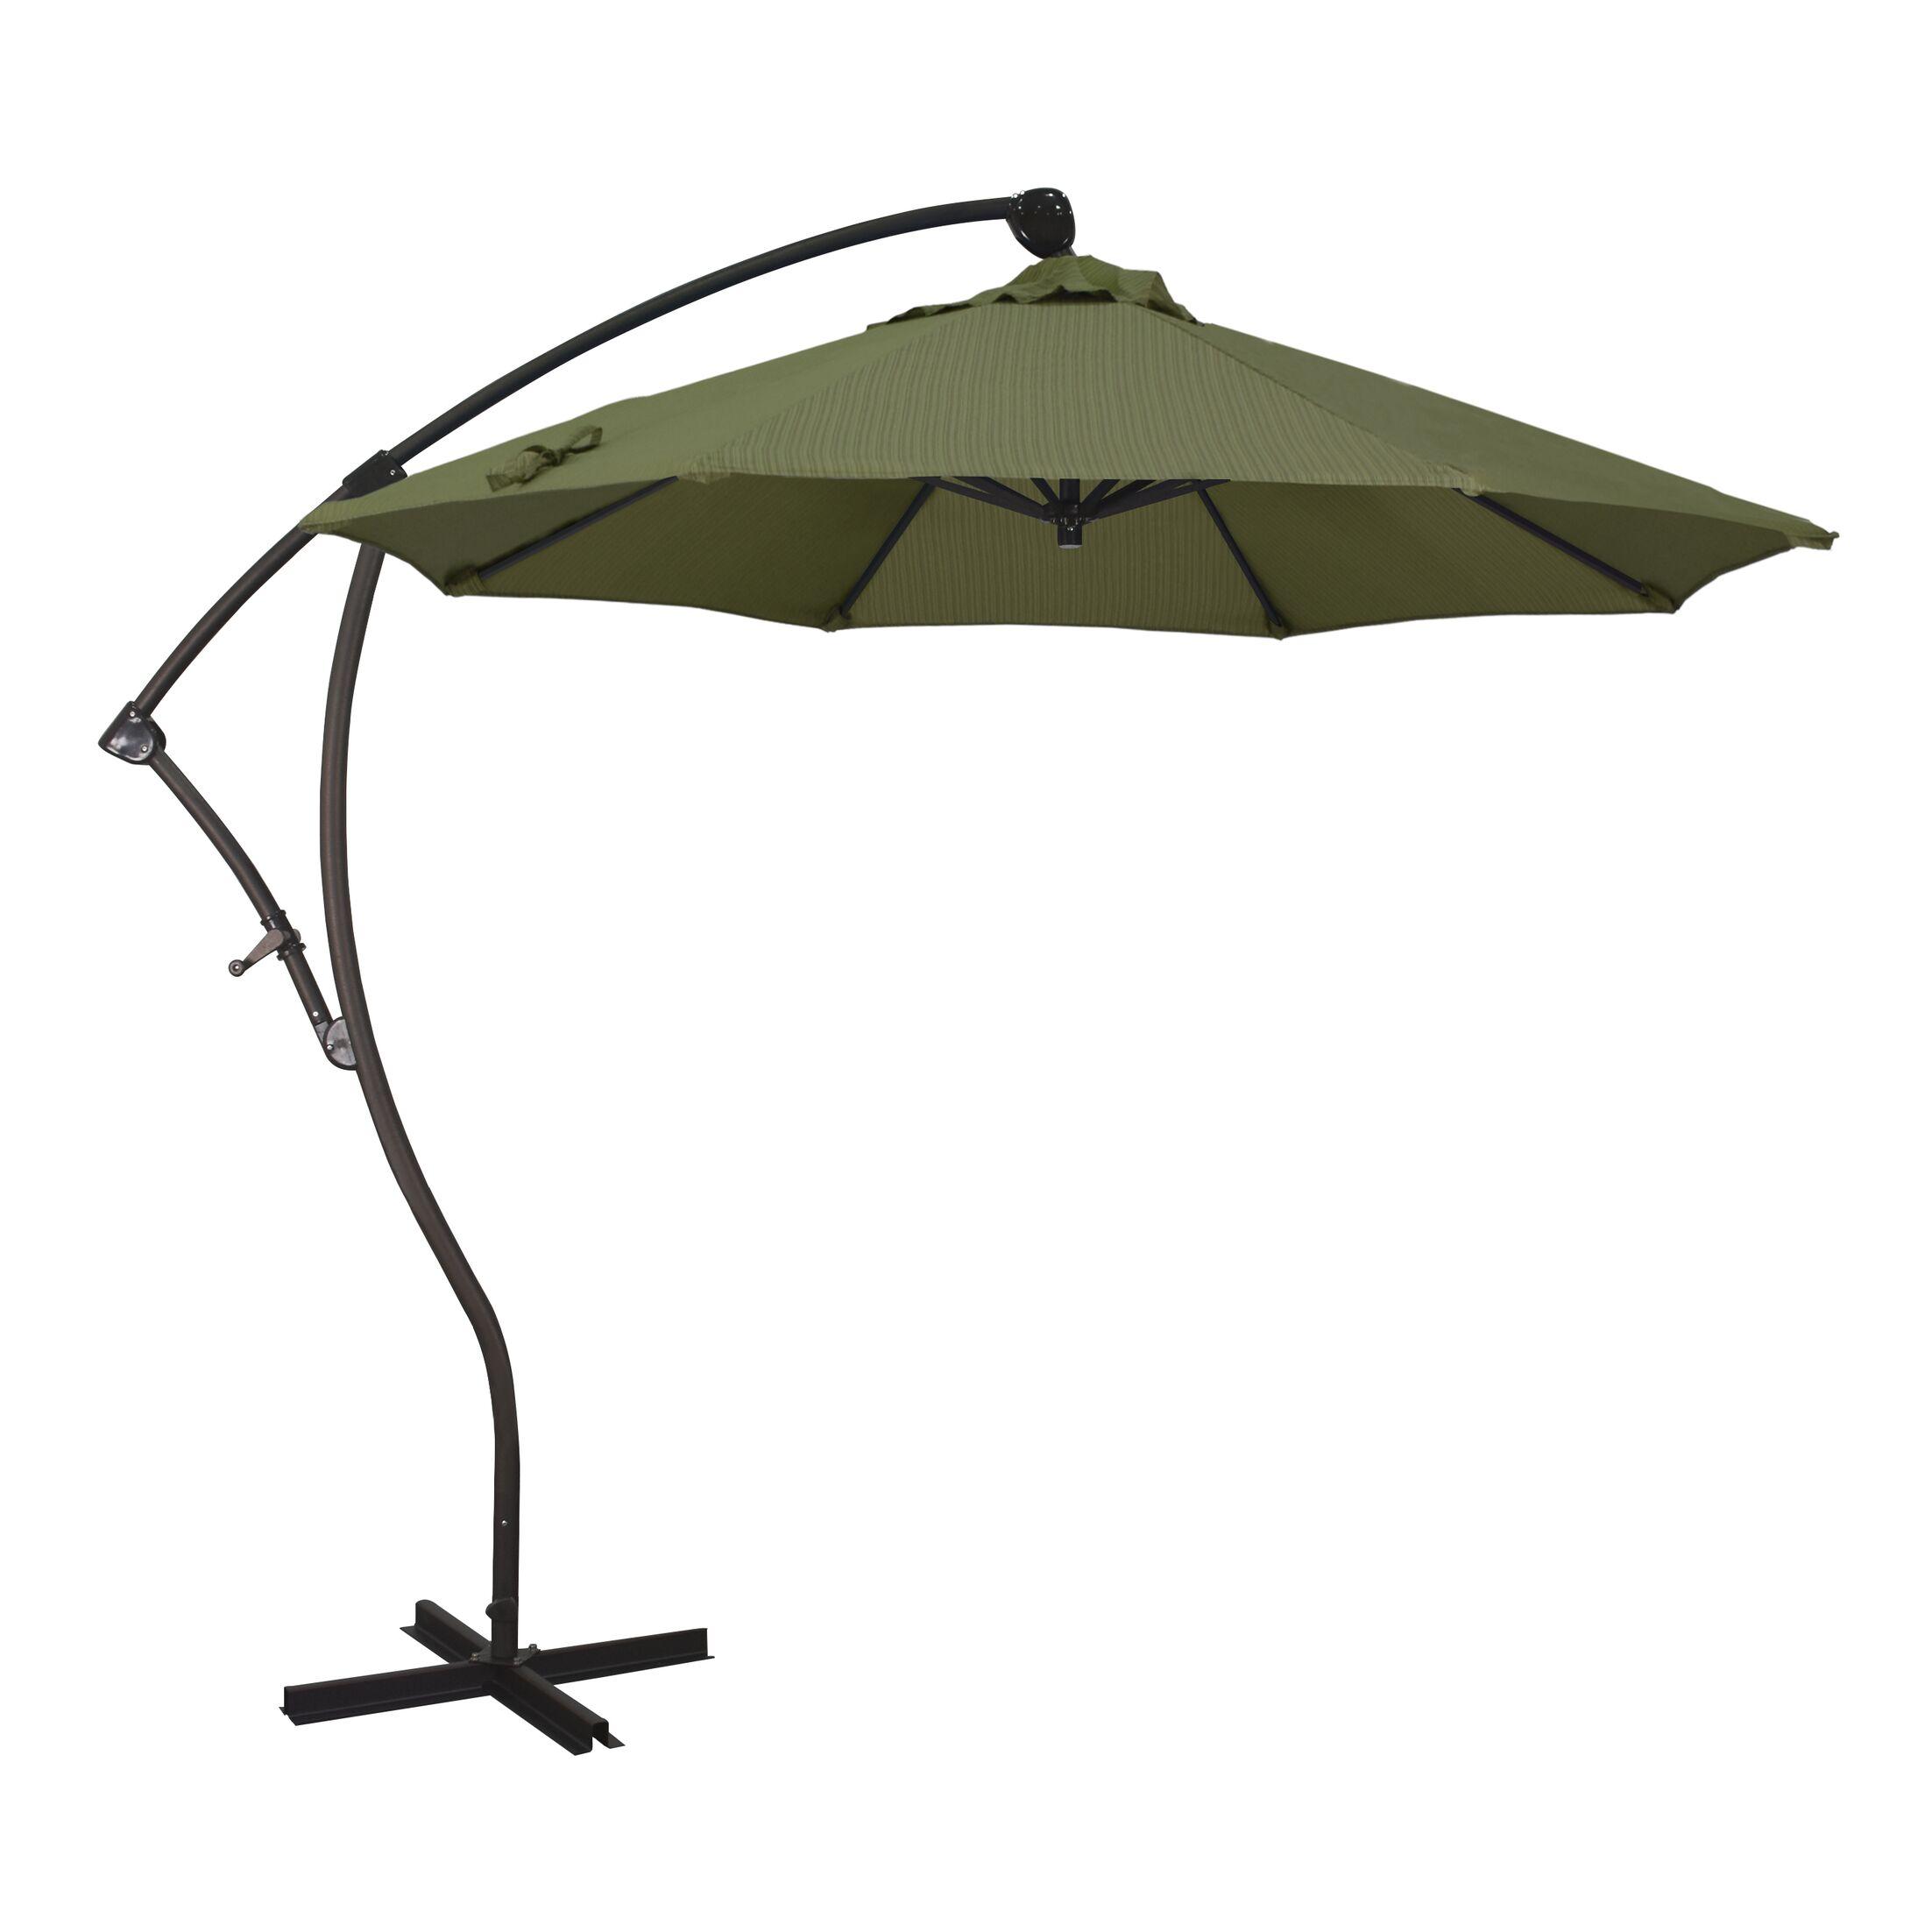 Bayside Series 9' Cantilever Umbrella Fabric: Terrace Fern